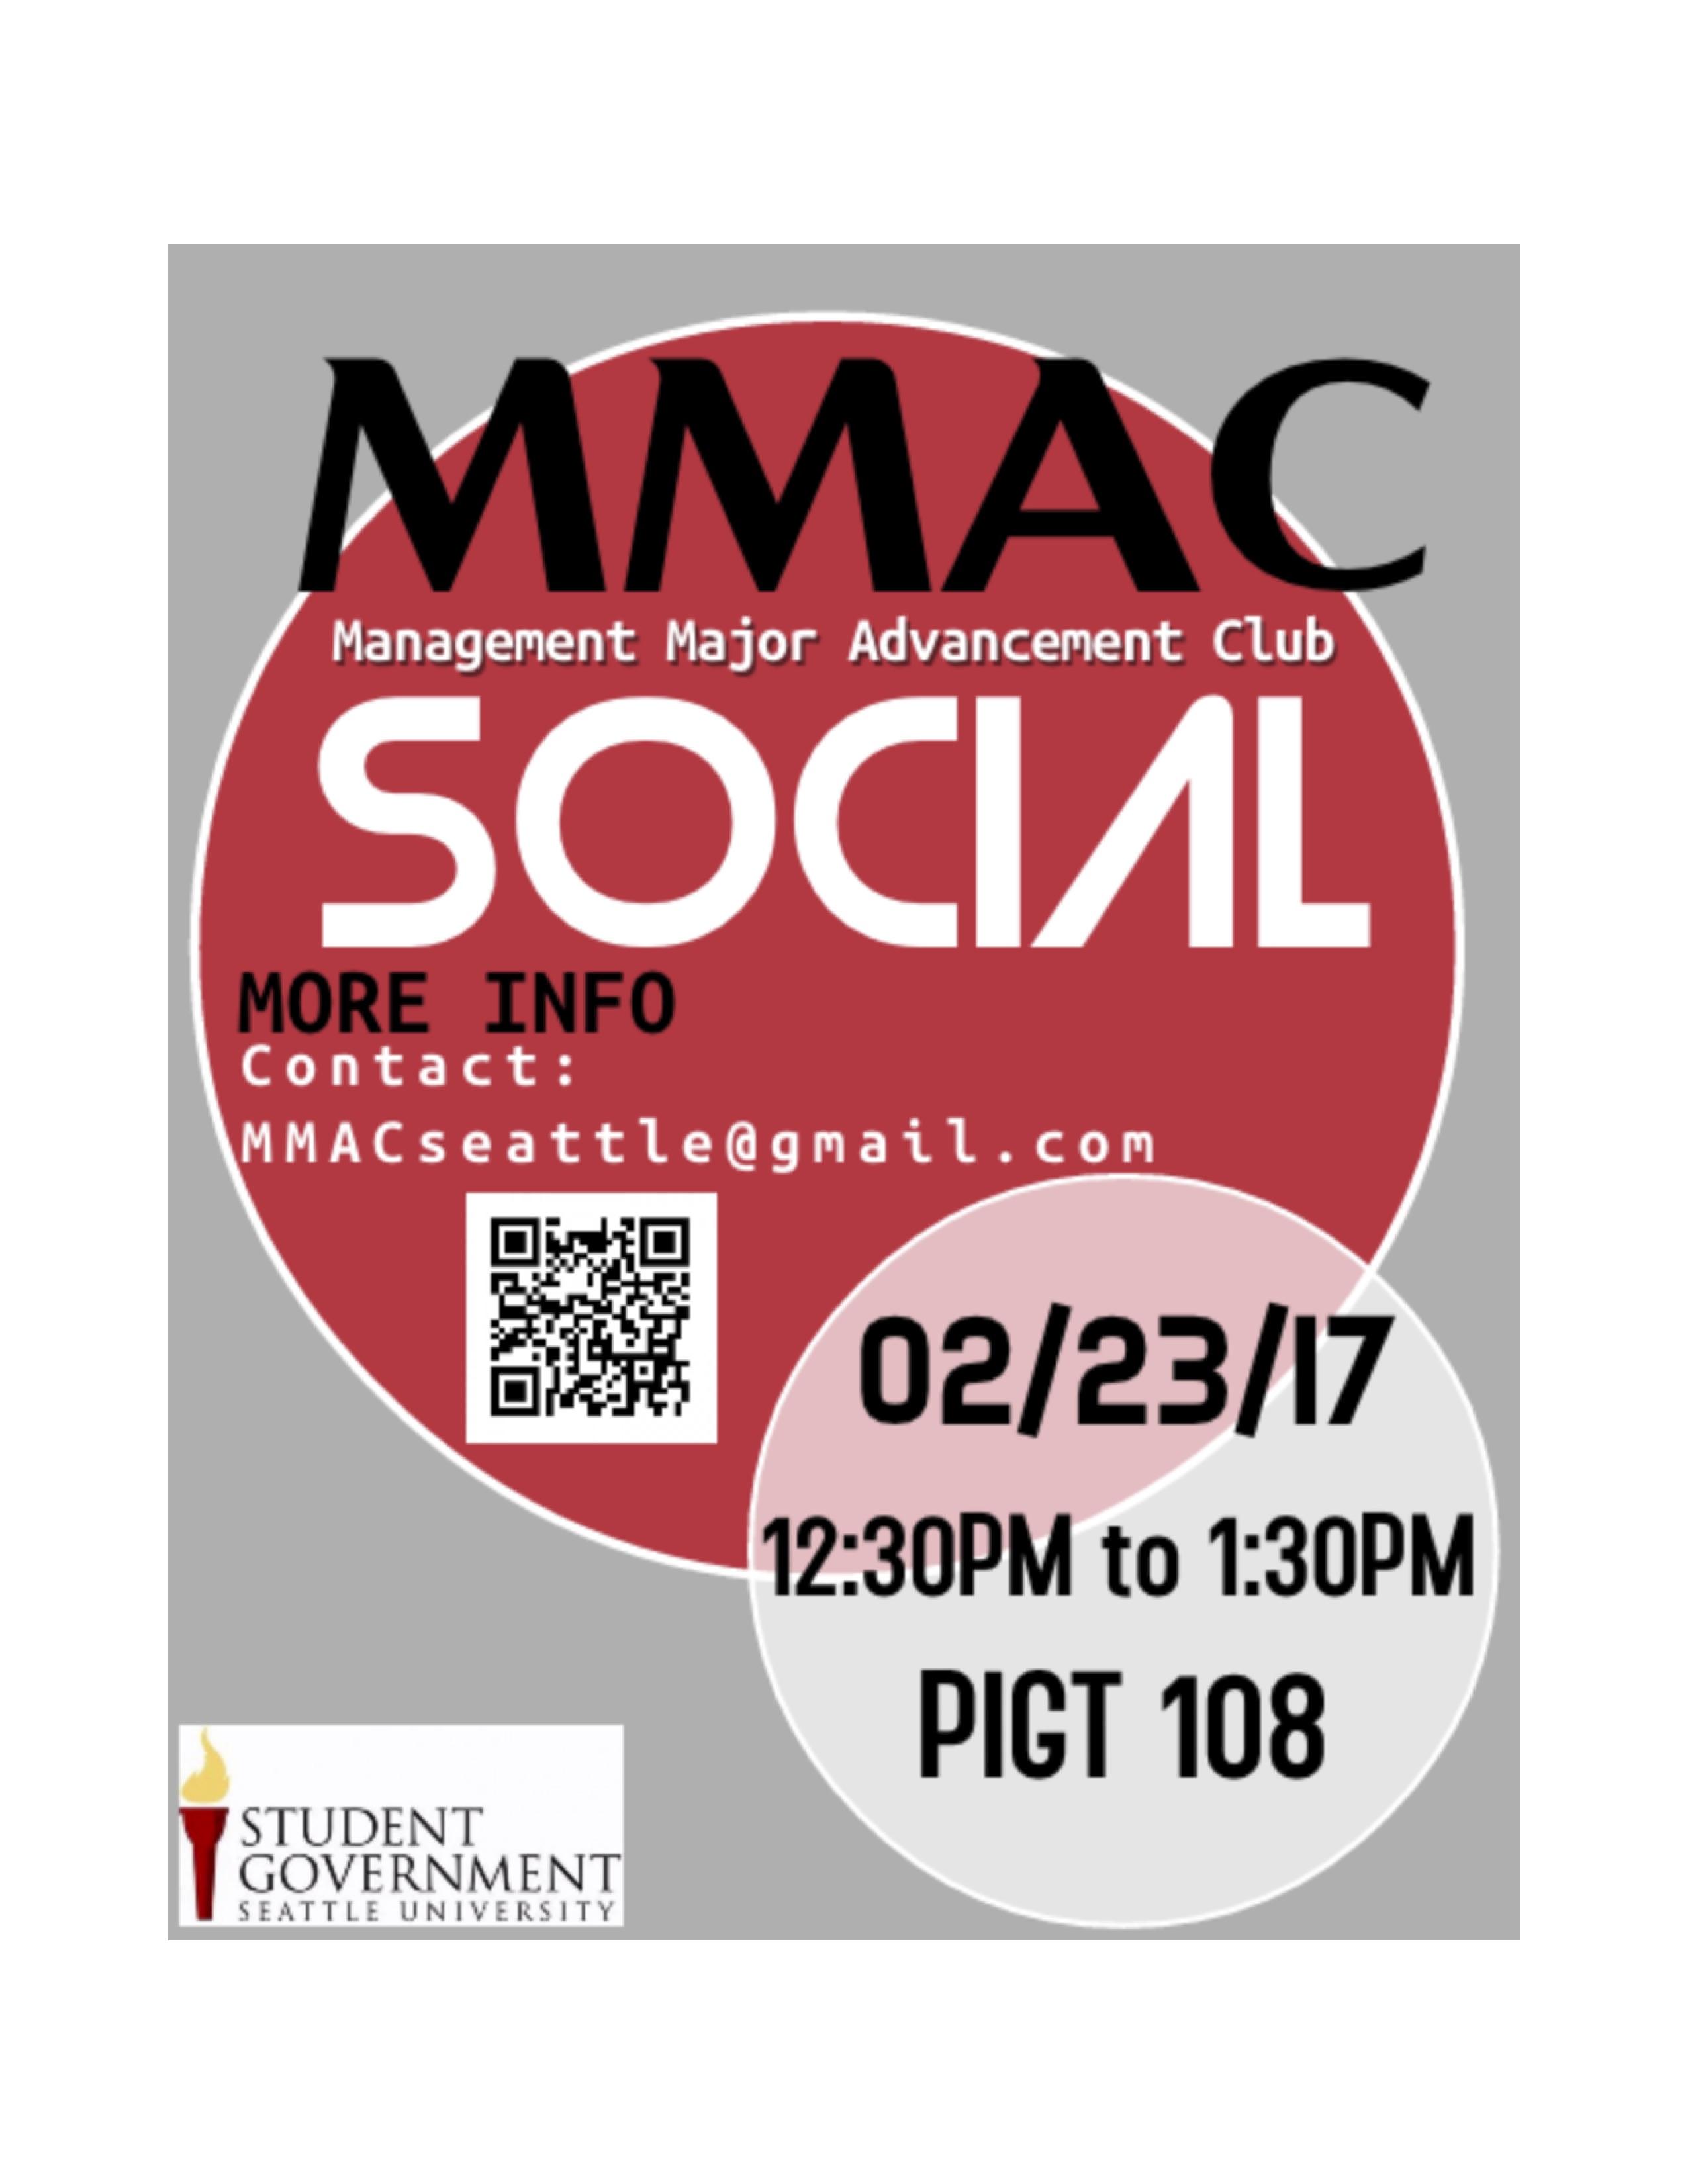 MMAC social